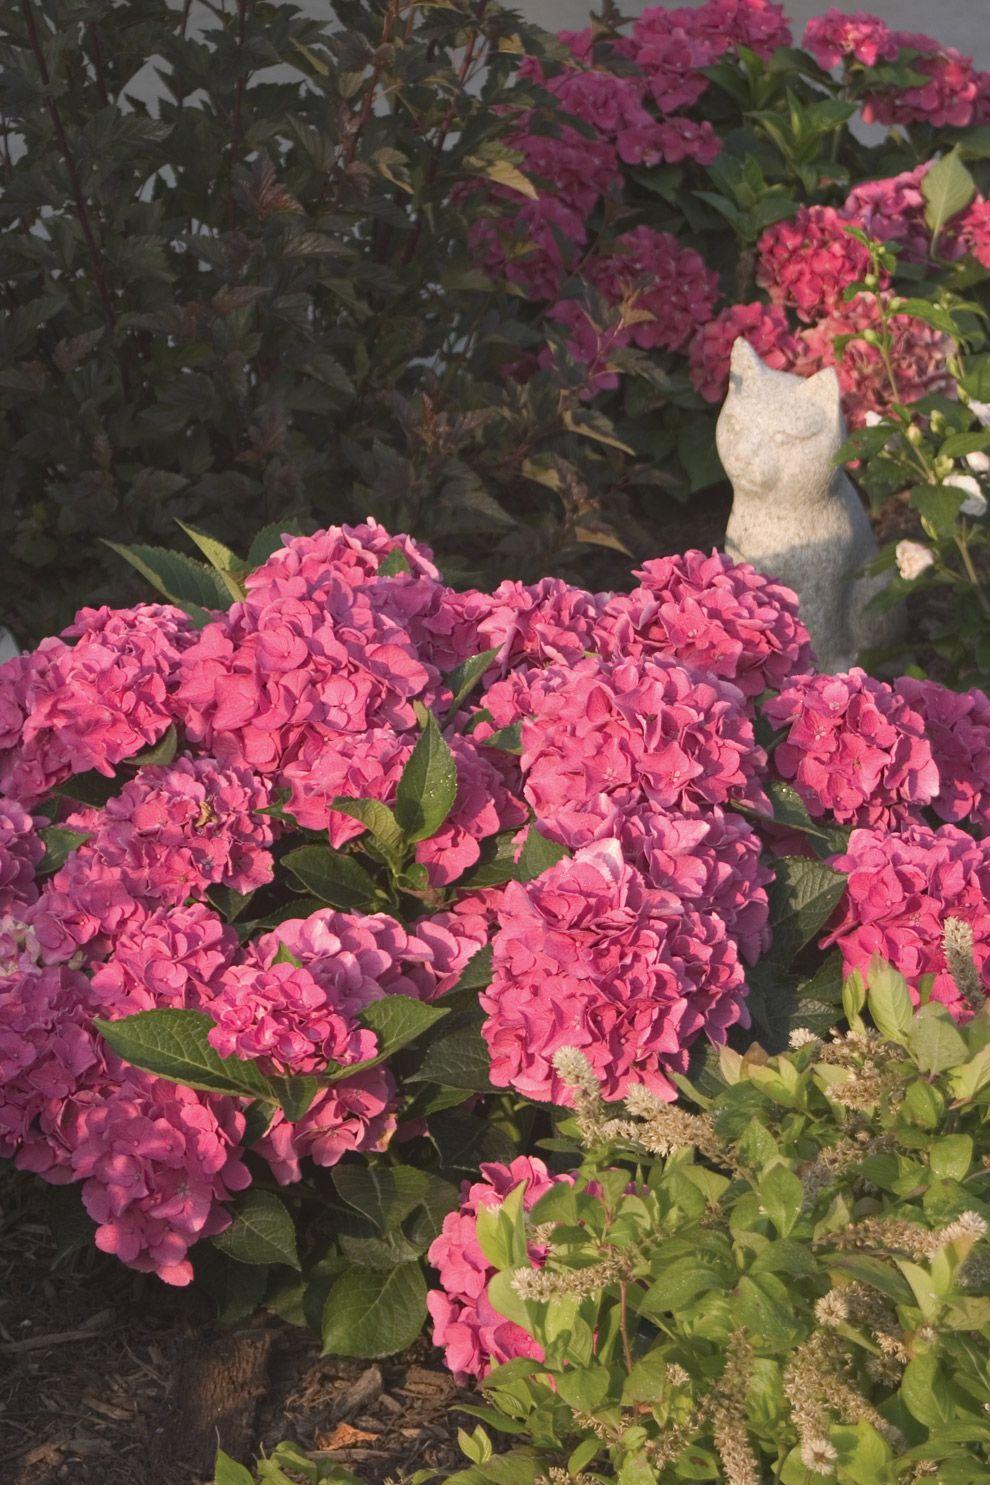 Wisconsin Gardening Enewsletter: Increase Your Success With Growing Hydrangeas